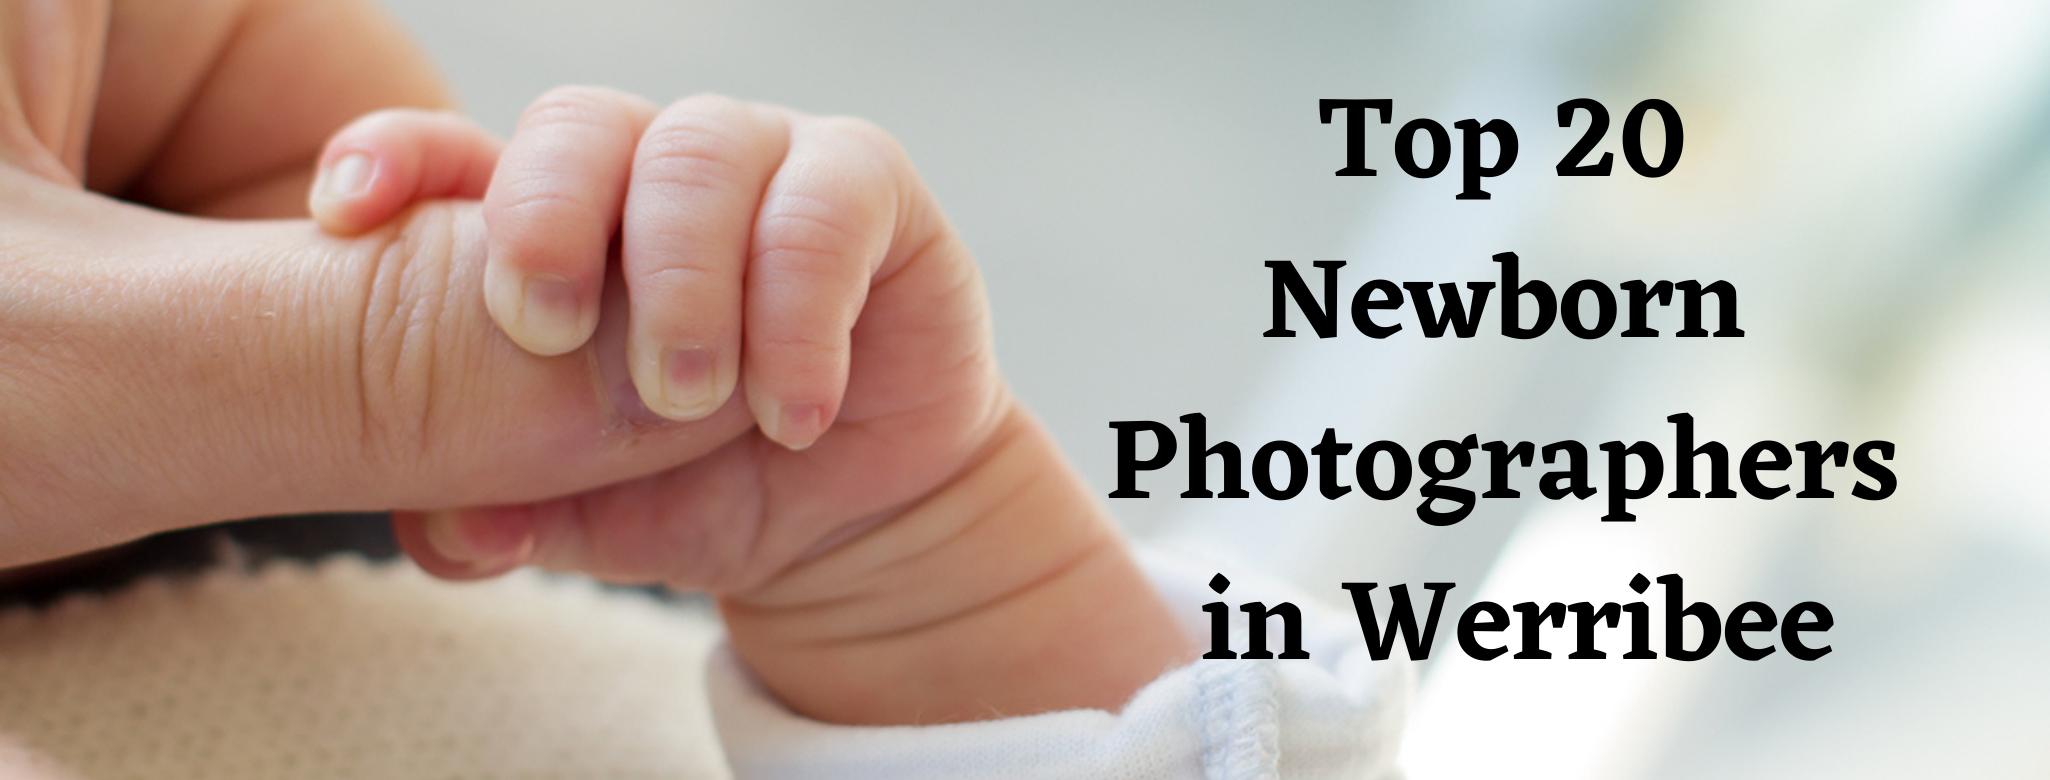 Top 20 Newborn Photographers in Sydney (4)